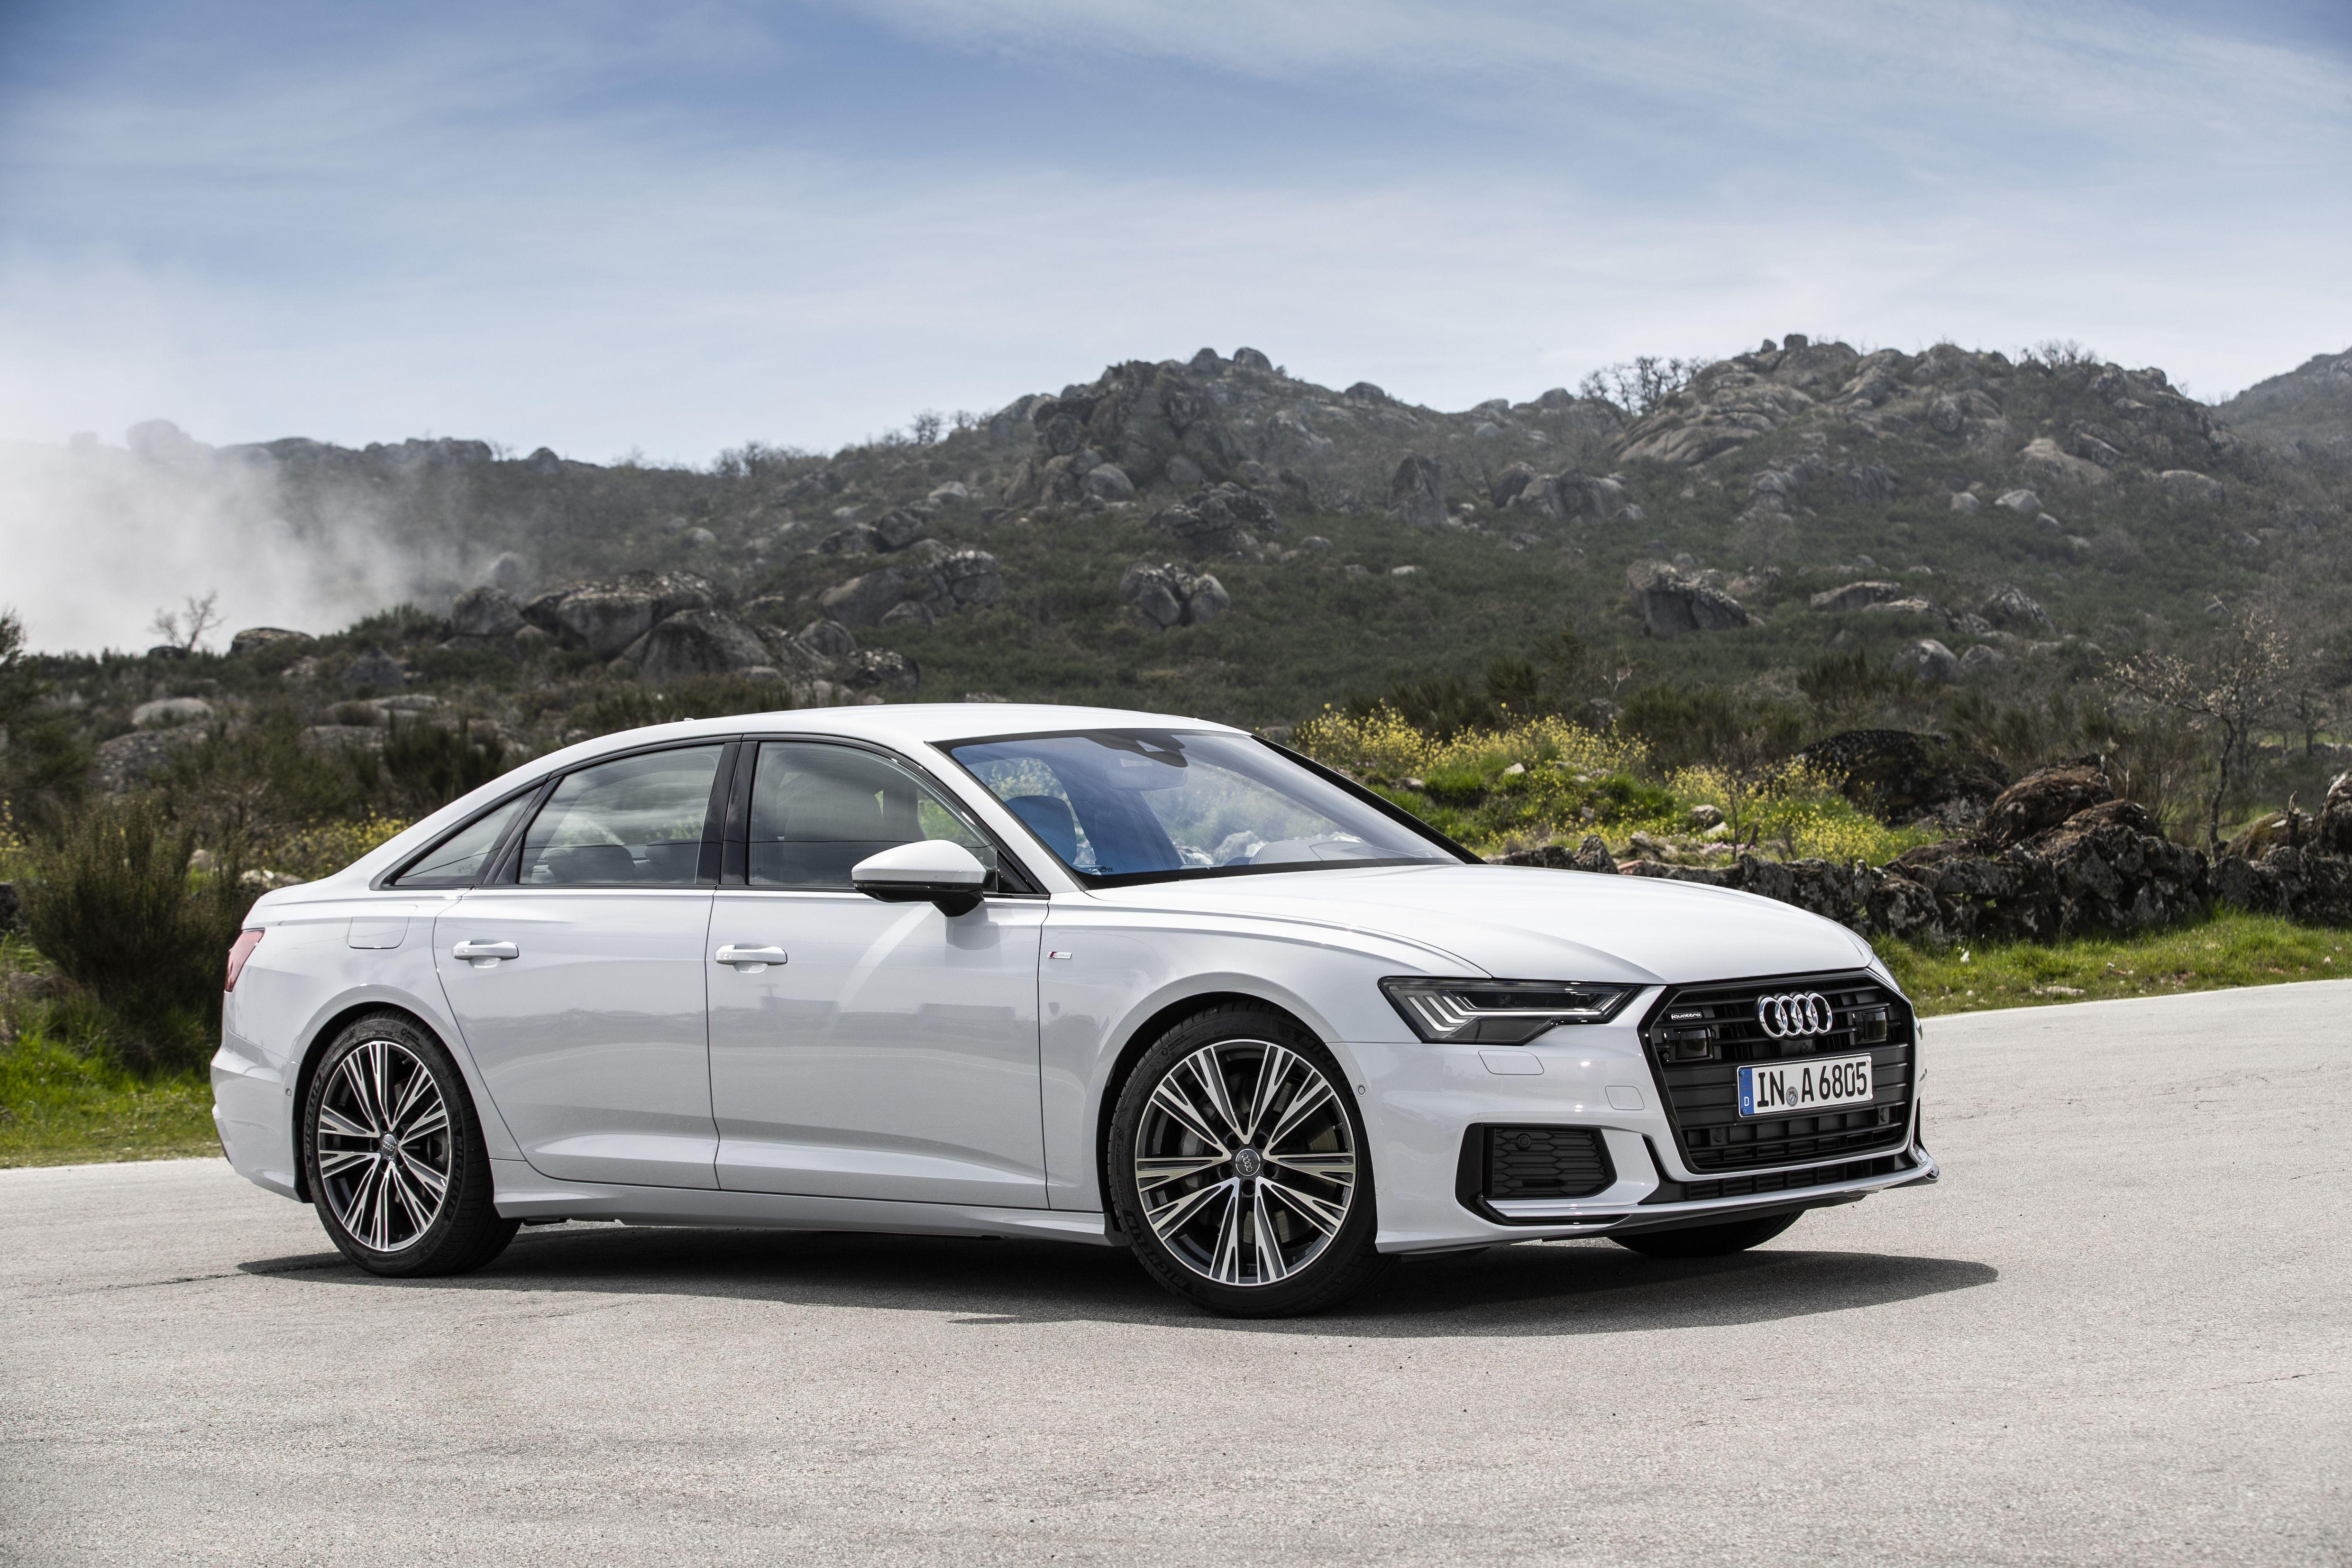 Aktualizacja W Klasie Biznes Nowe Audi A6 Limousine Audi S6 Audi A6 Audi A6 Quattro